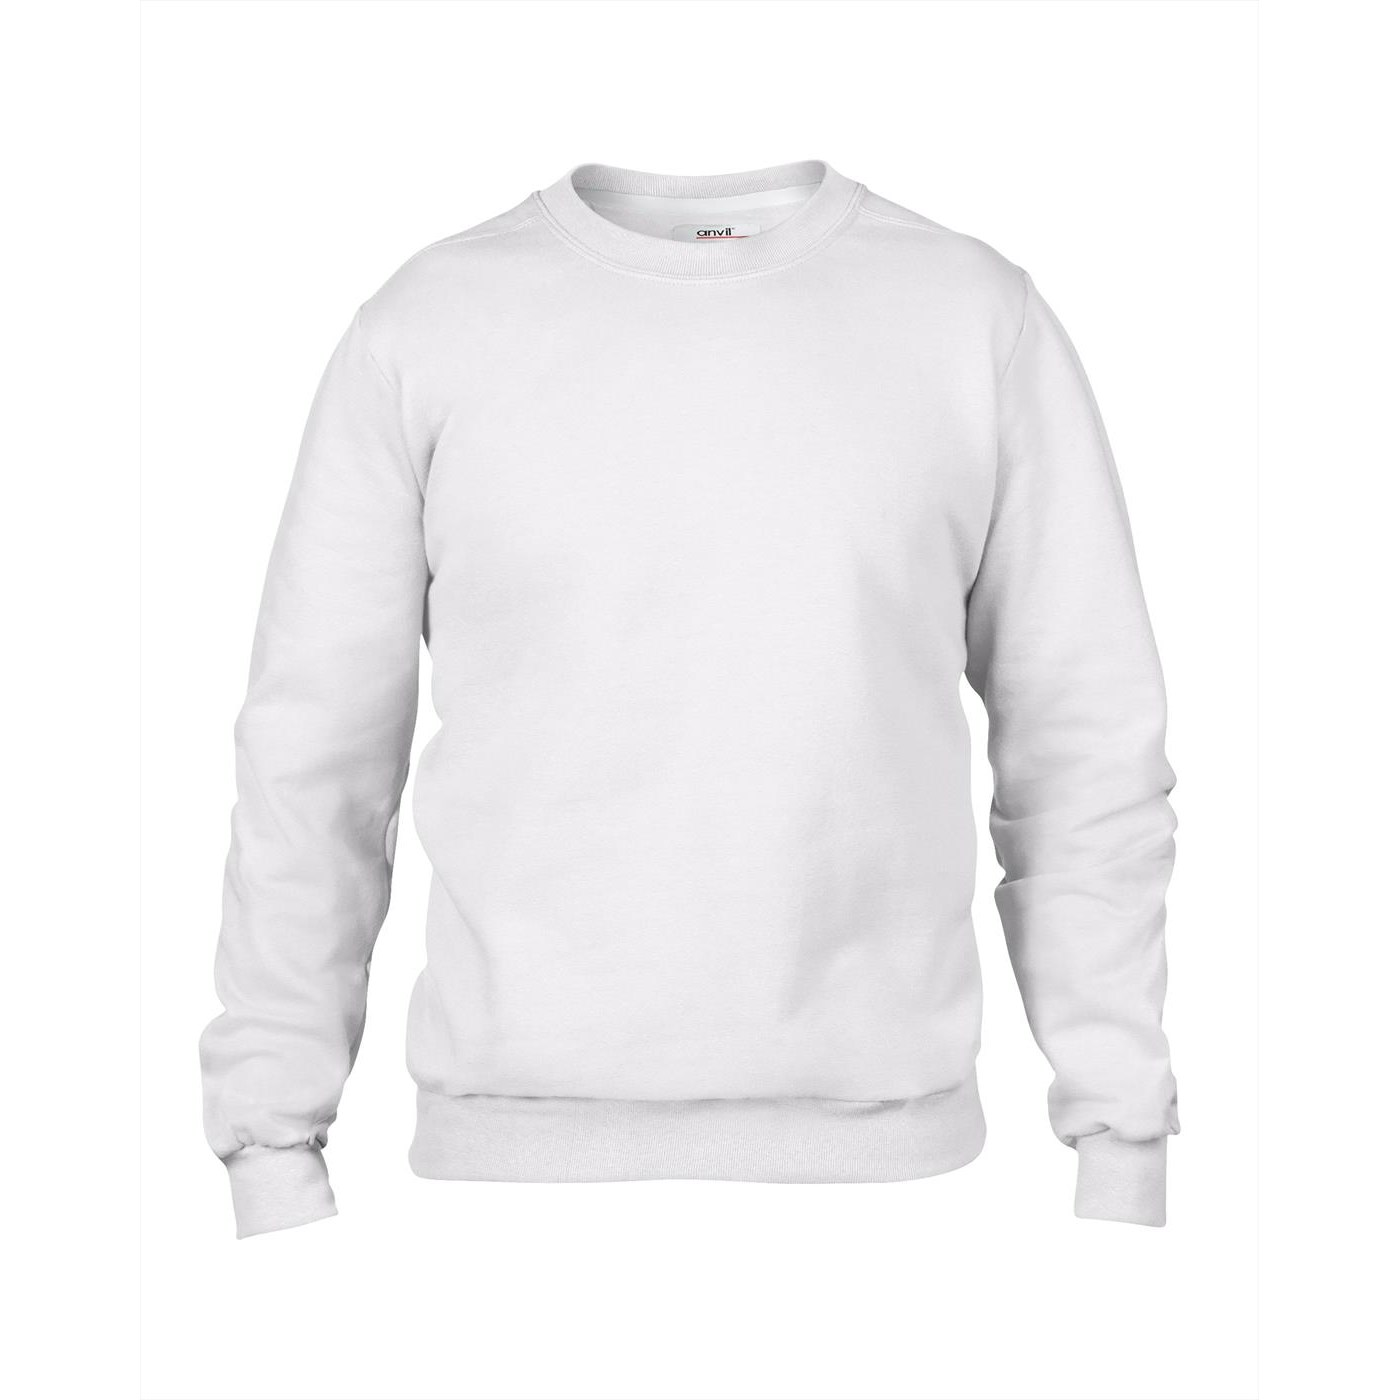 6ef2fc56 Anvil Men's Set-in Sleeve Sweatshirt AV501